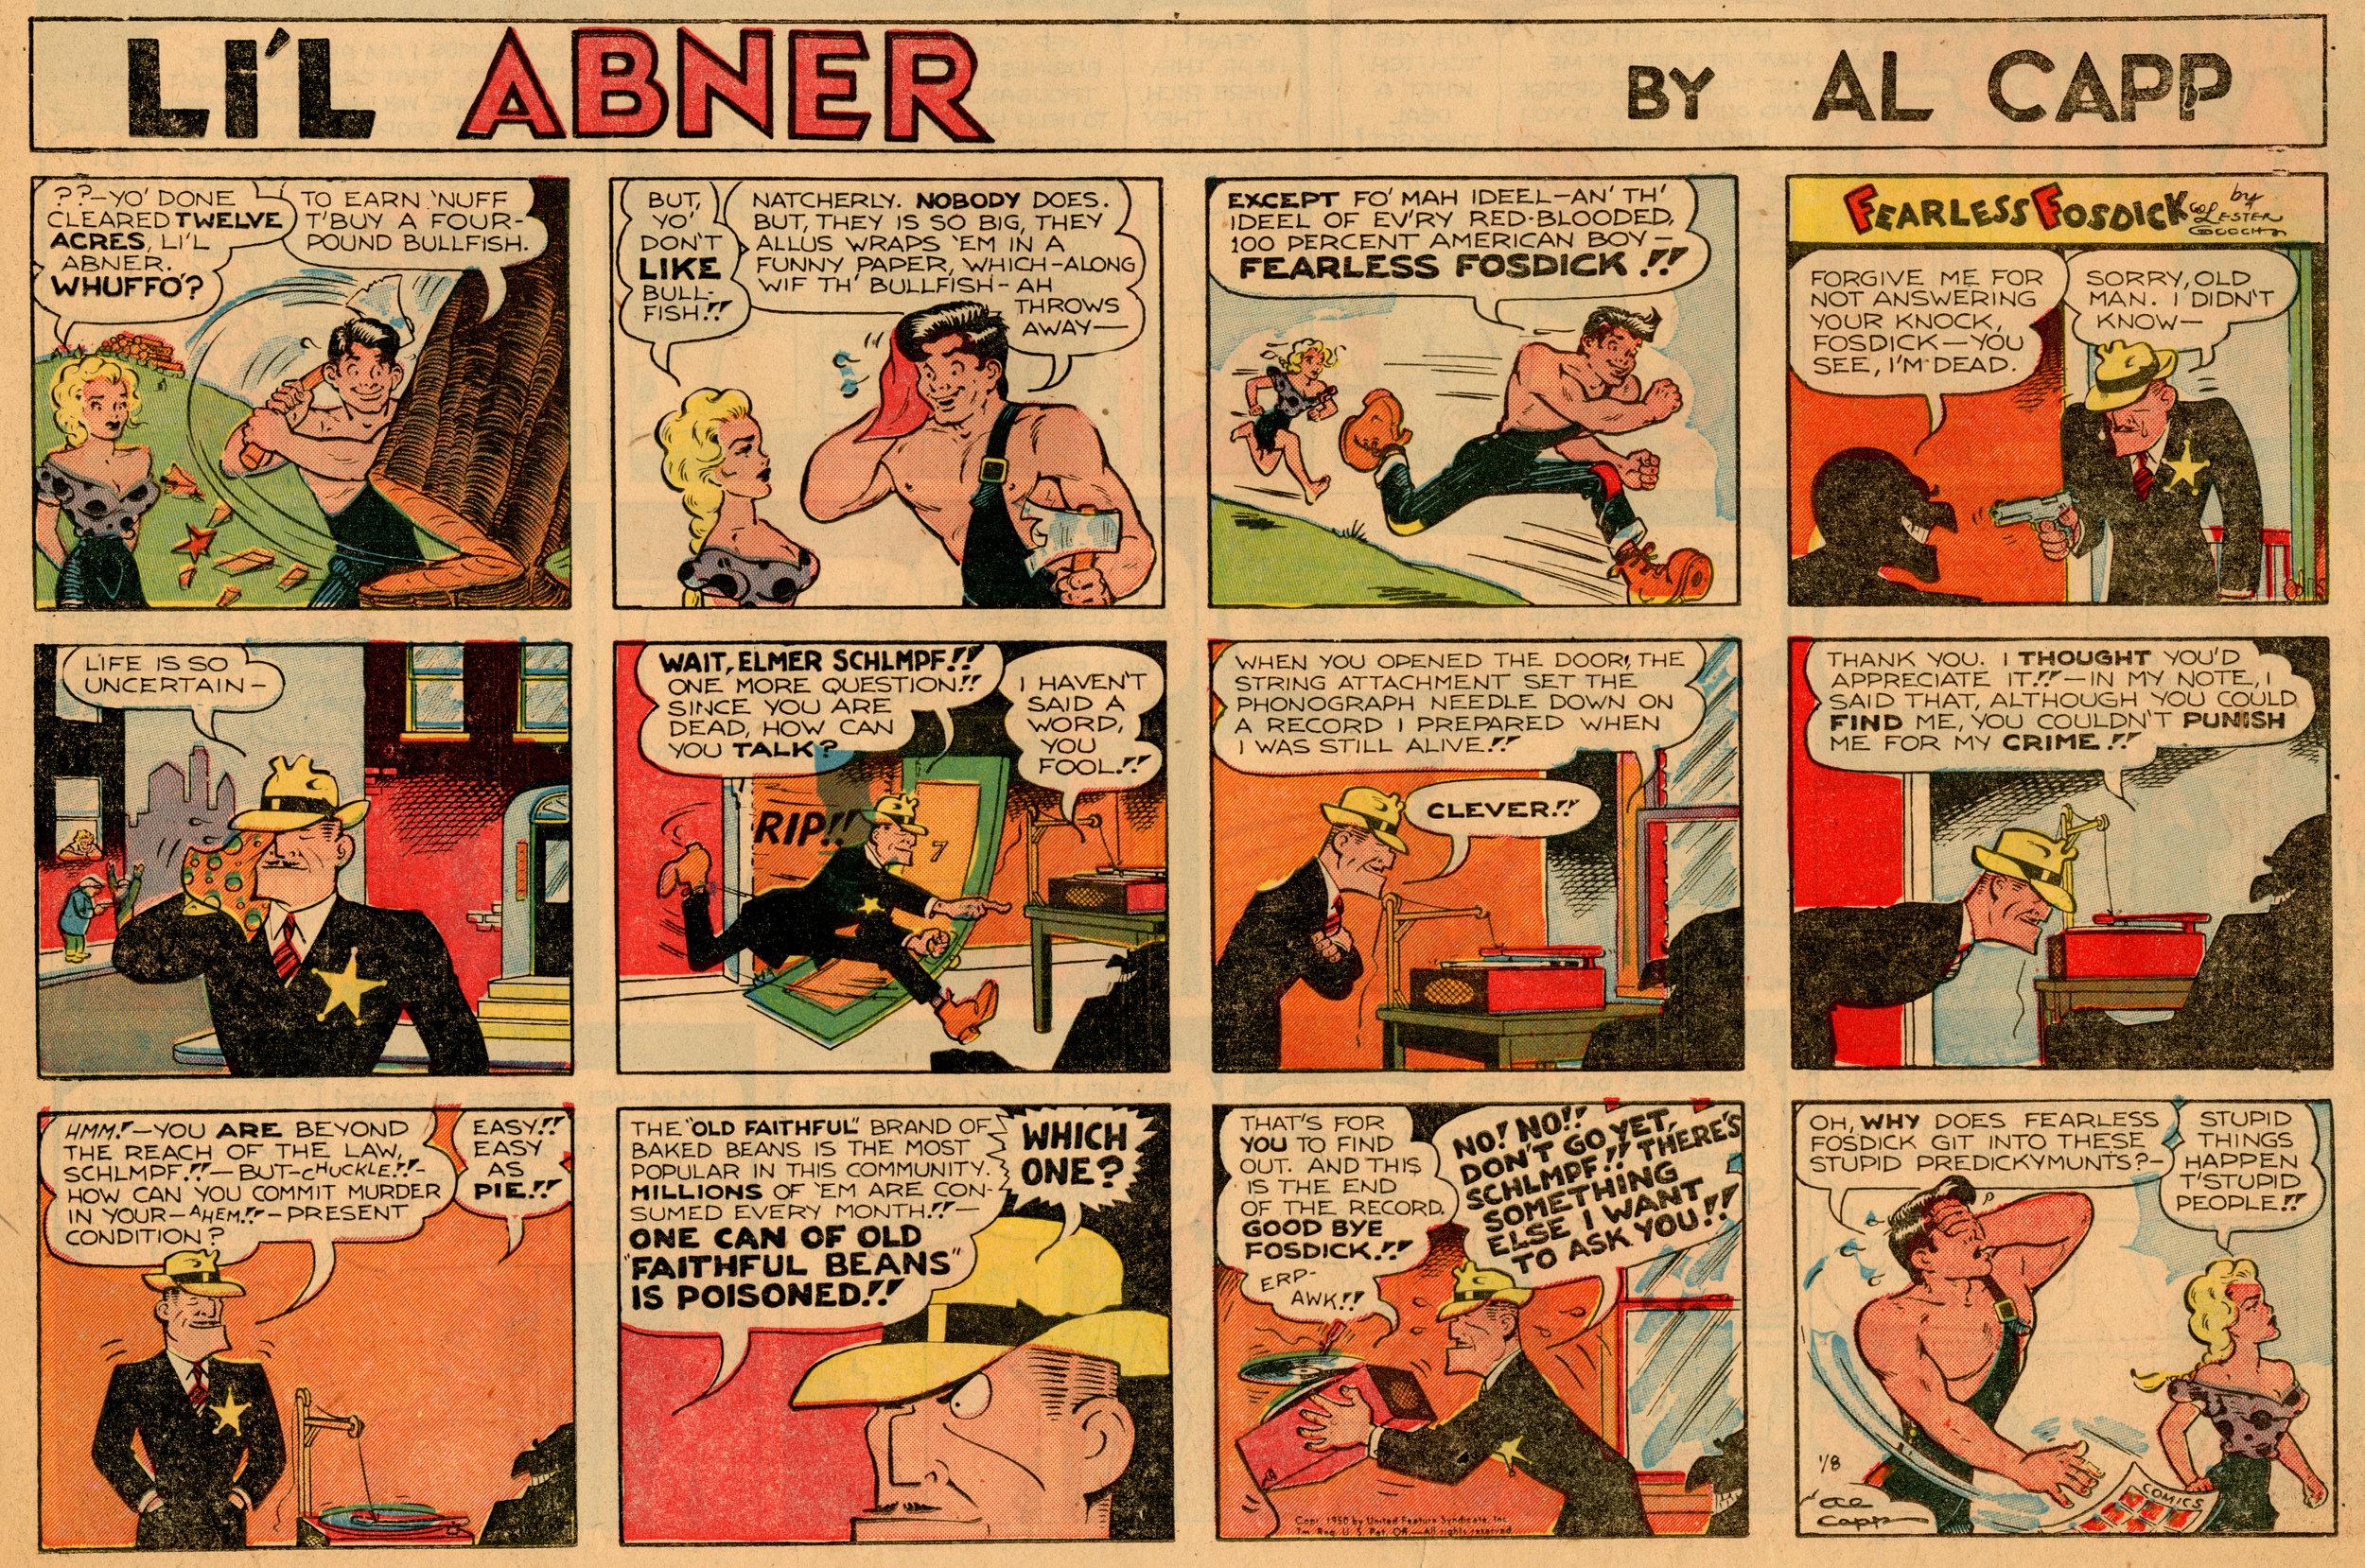 LIL-ABNER-19500108.jpg